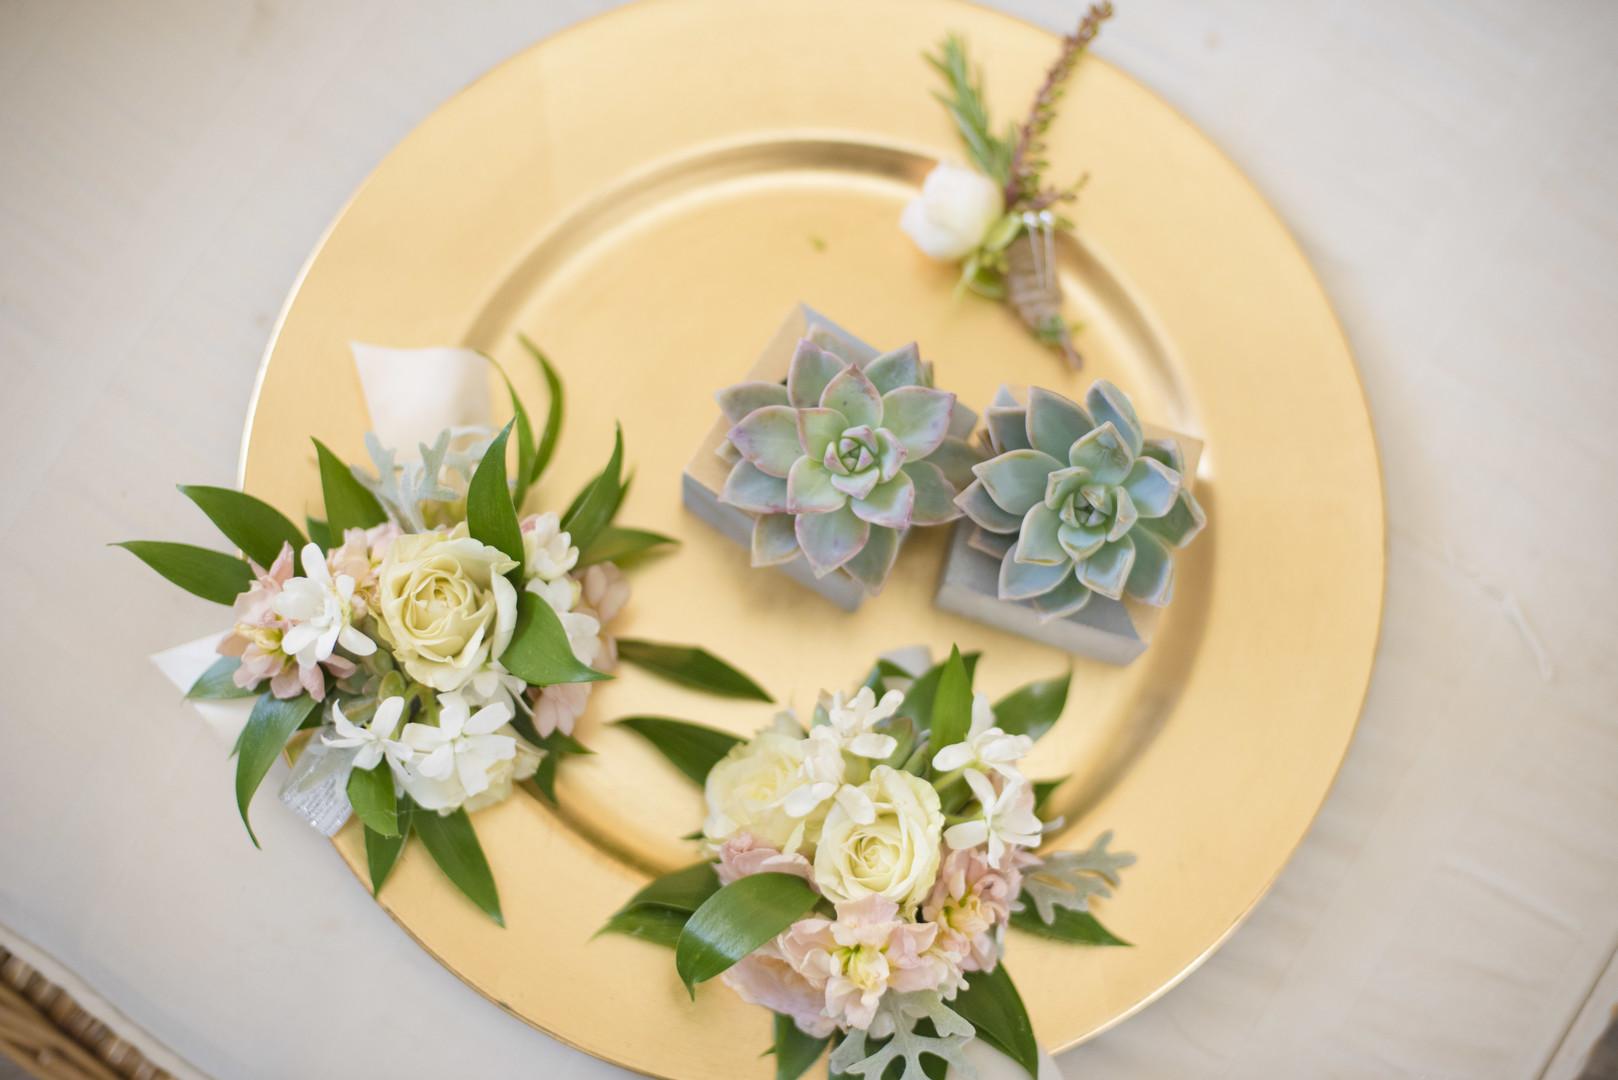 www.santabarbarawedding.com | Venue: Dos Pueblos Ranch | Photographer: ByCherry Photography | Event Designer: Elan Event Rentals | Place Setting